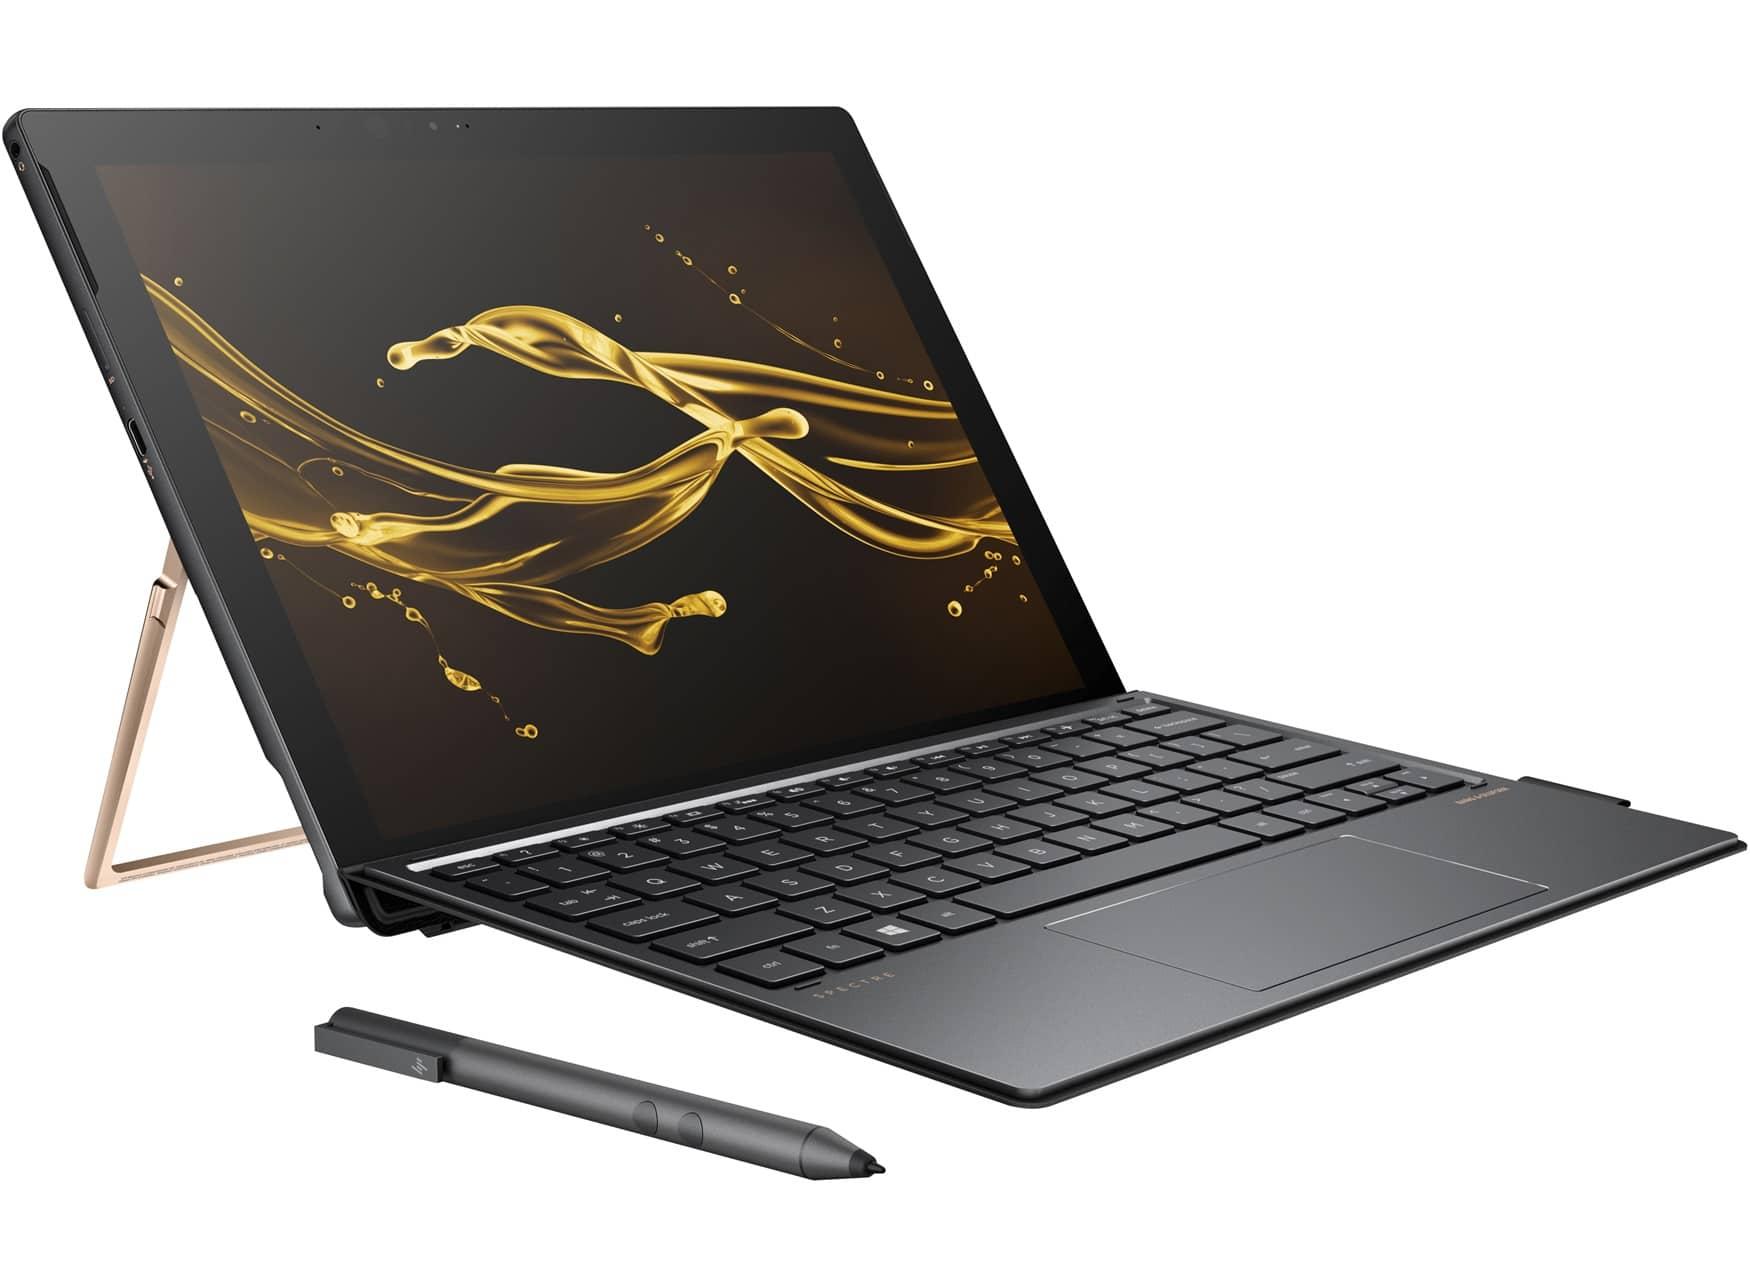 HP Spectre x2 12-c000nf, ultrabook/tablette 12'' 3K/2K i5 Kaby (768€)